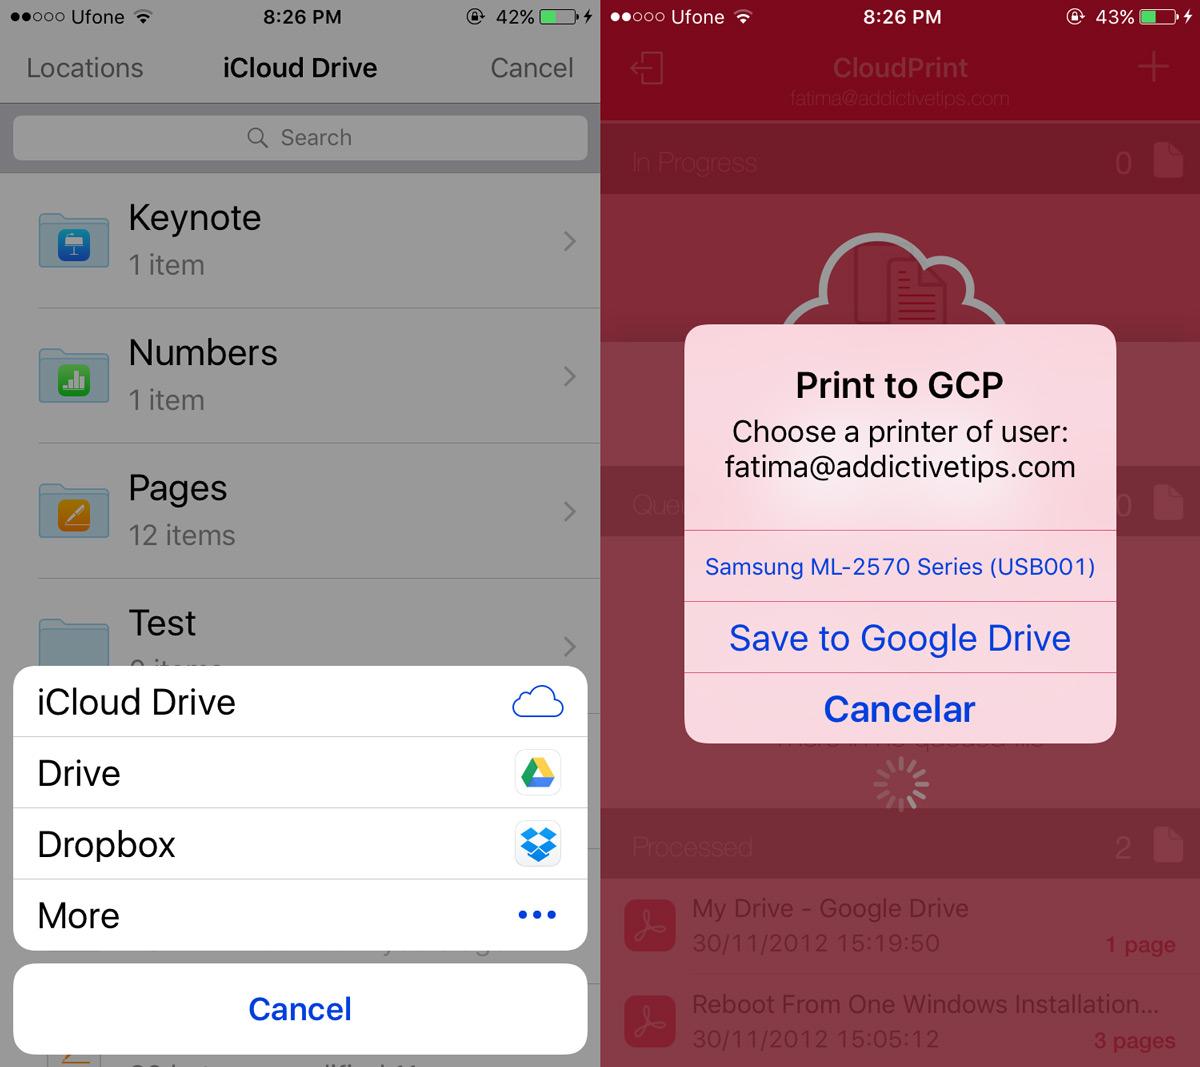 cloudprint-choose-printer